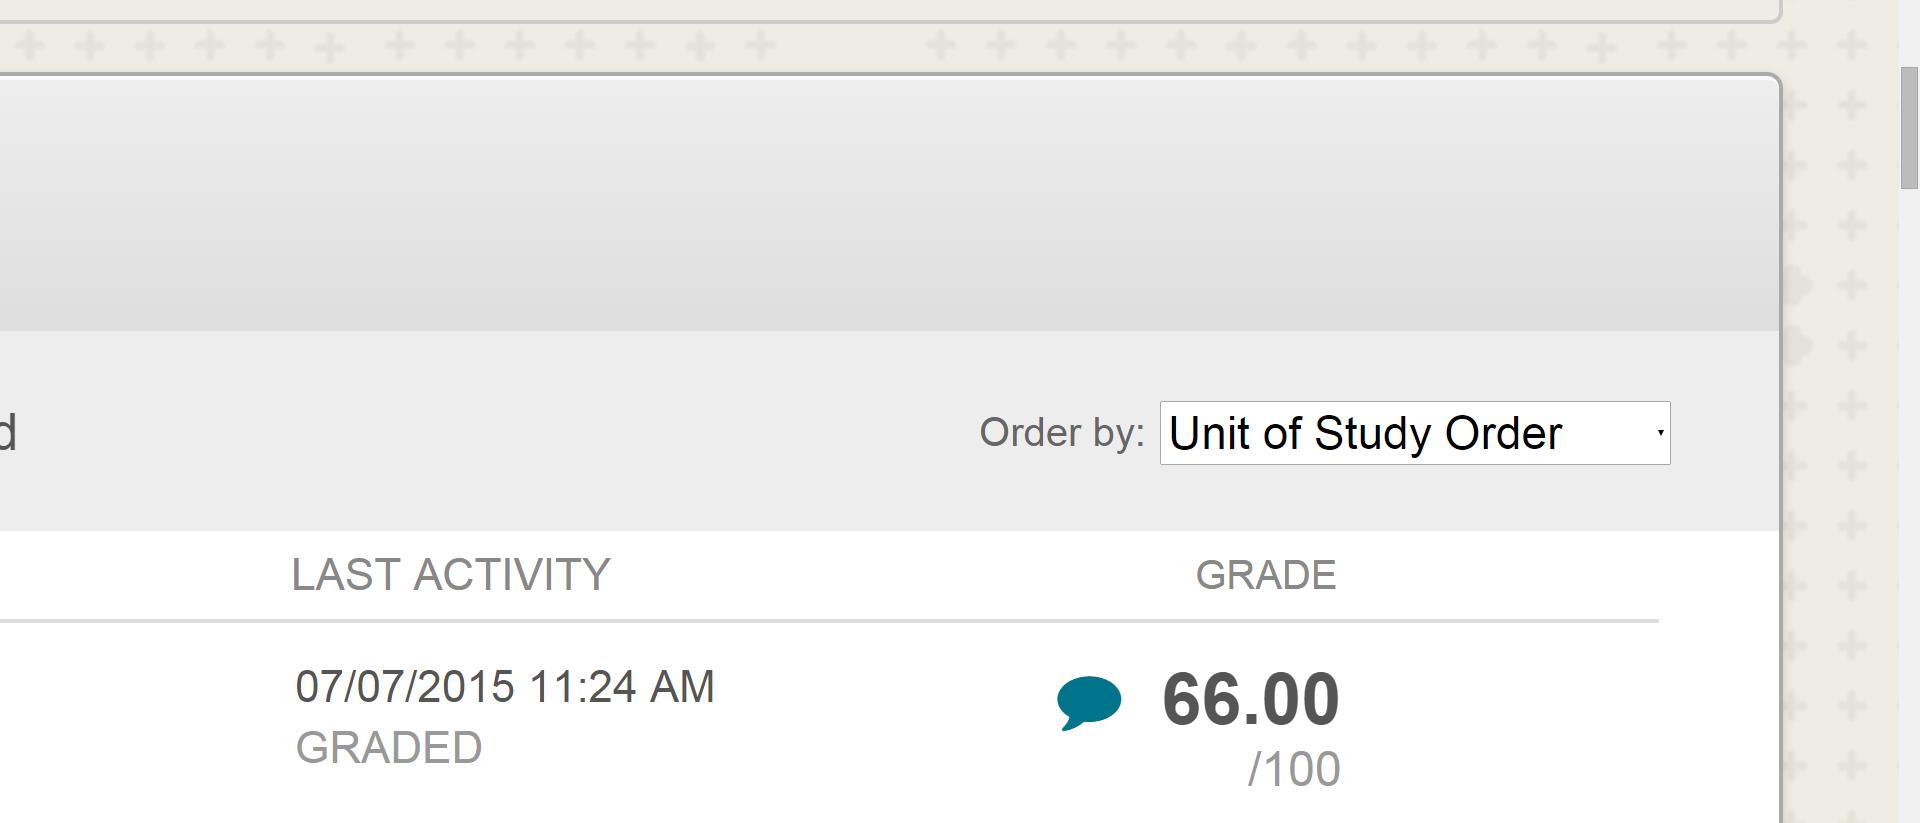 my grade: 66/100